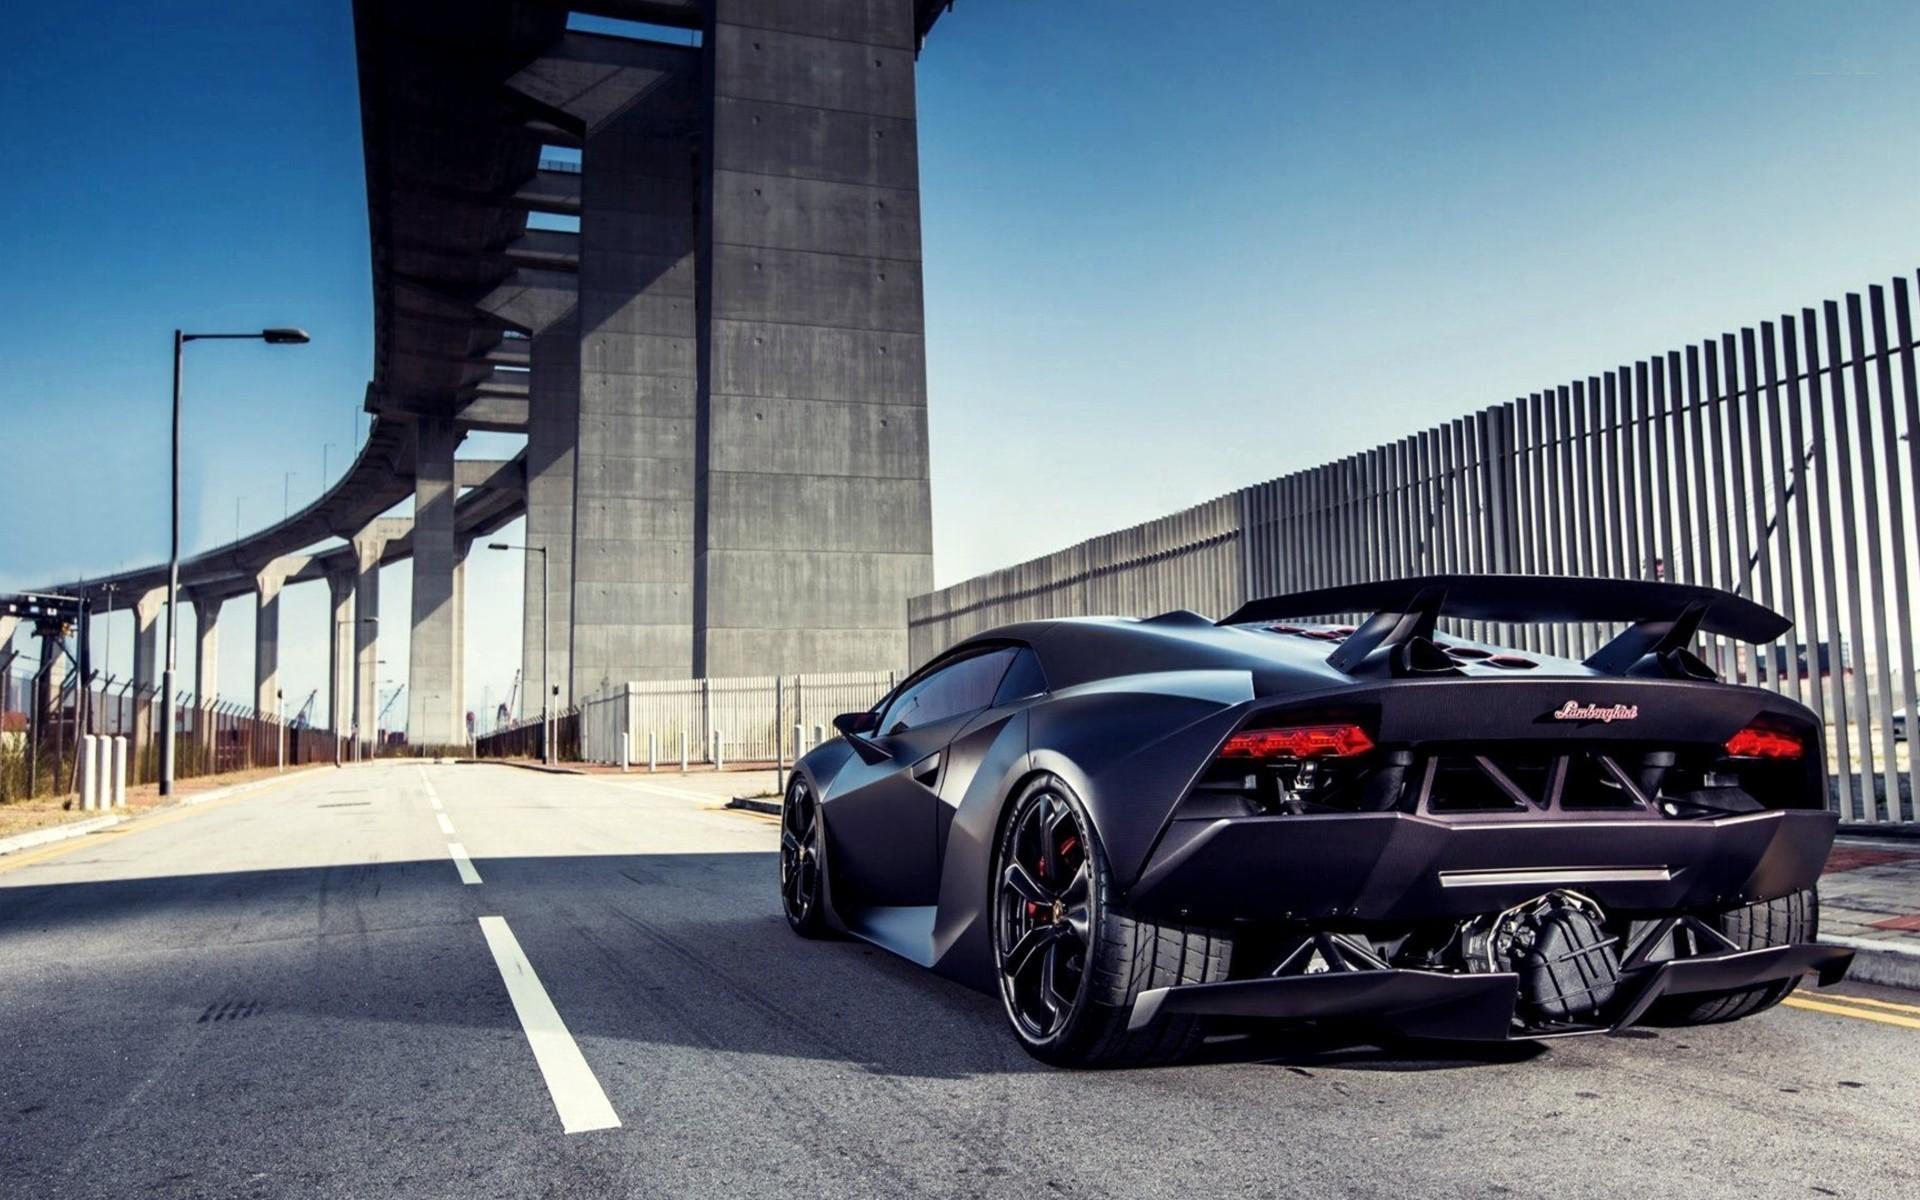 Lamborghini Sesto Elemento Wallpapers, Amazing High Definition .